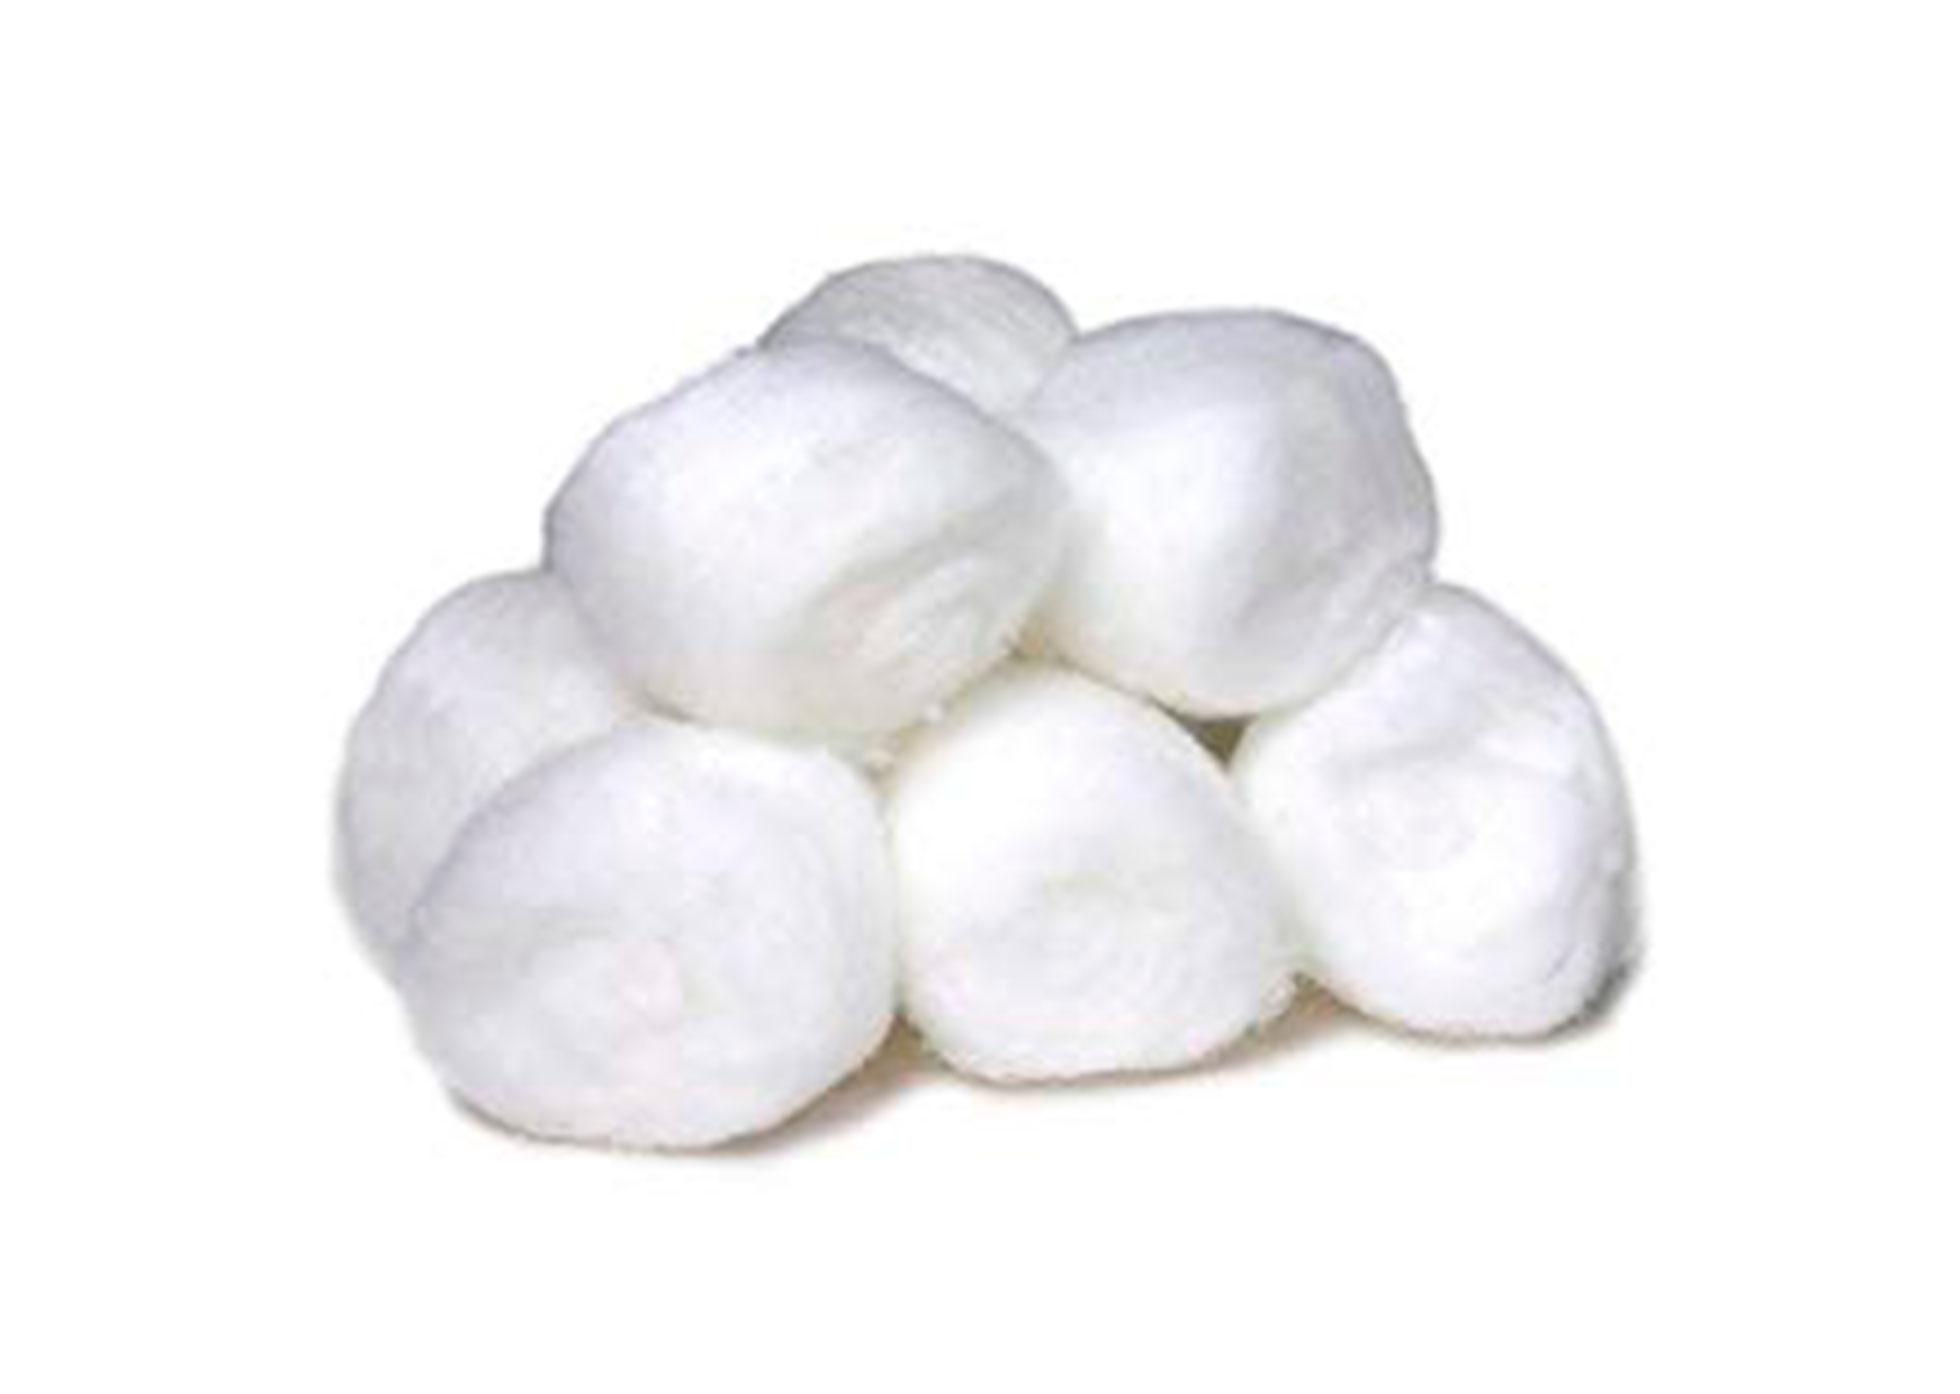 cotton-wool-balls.jpg